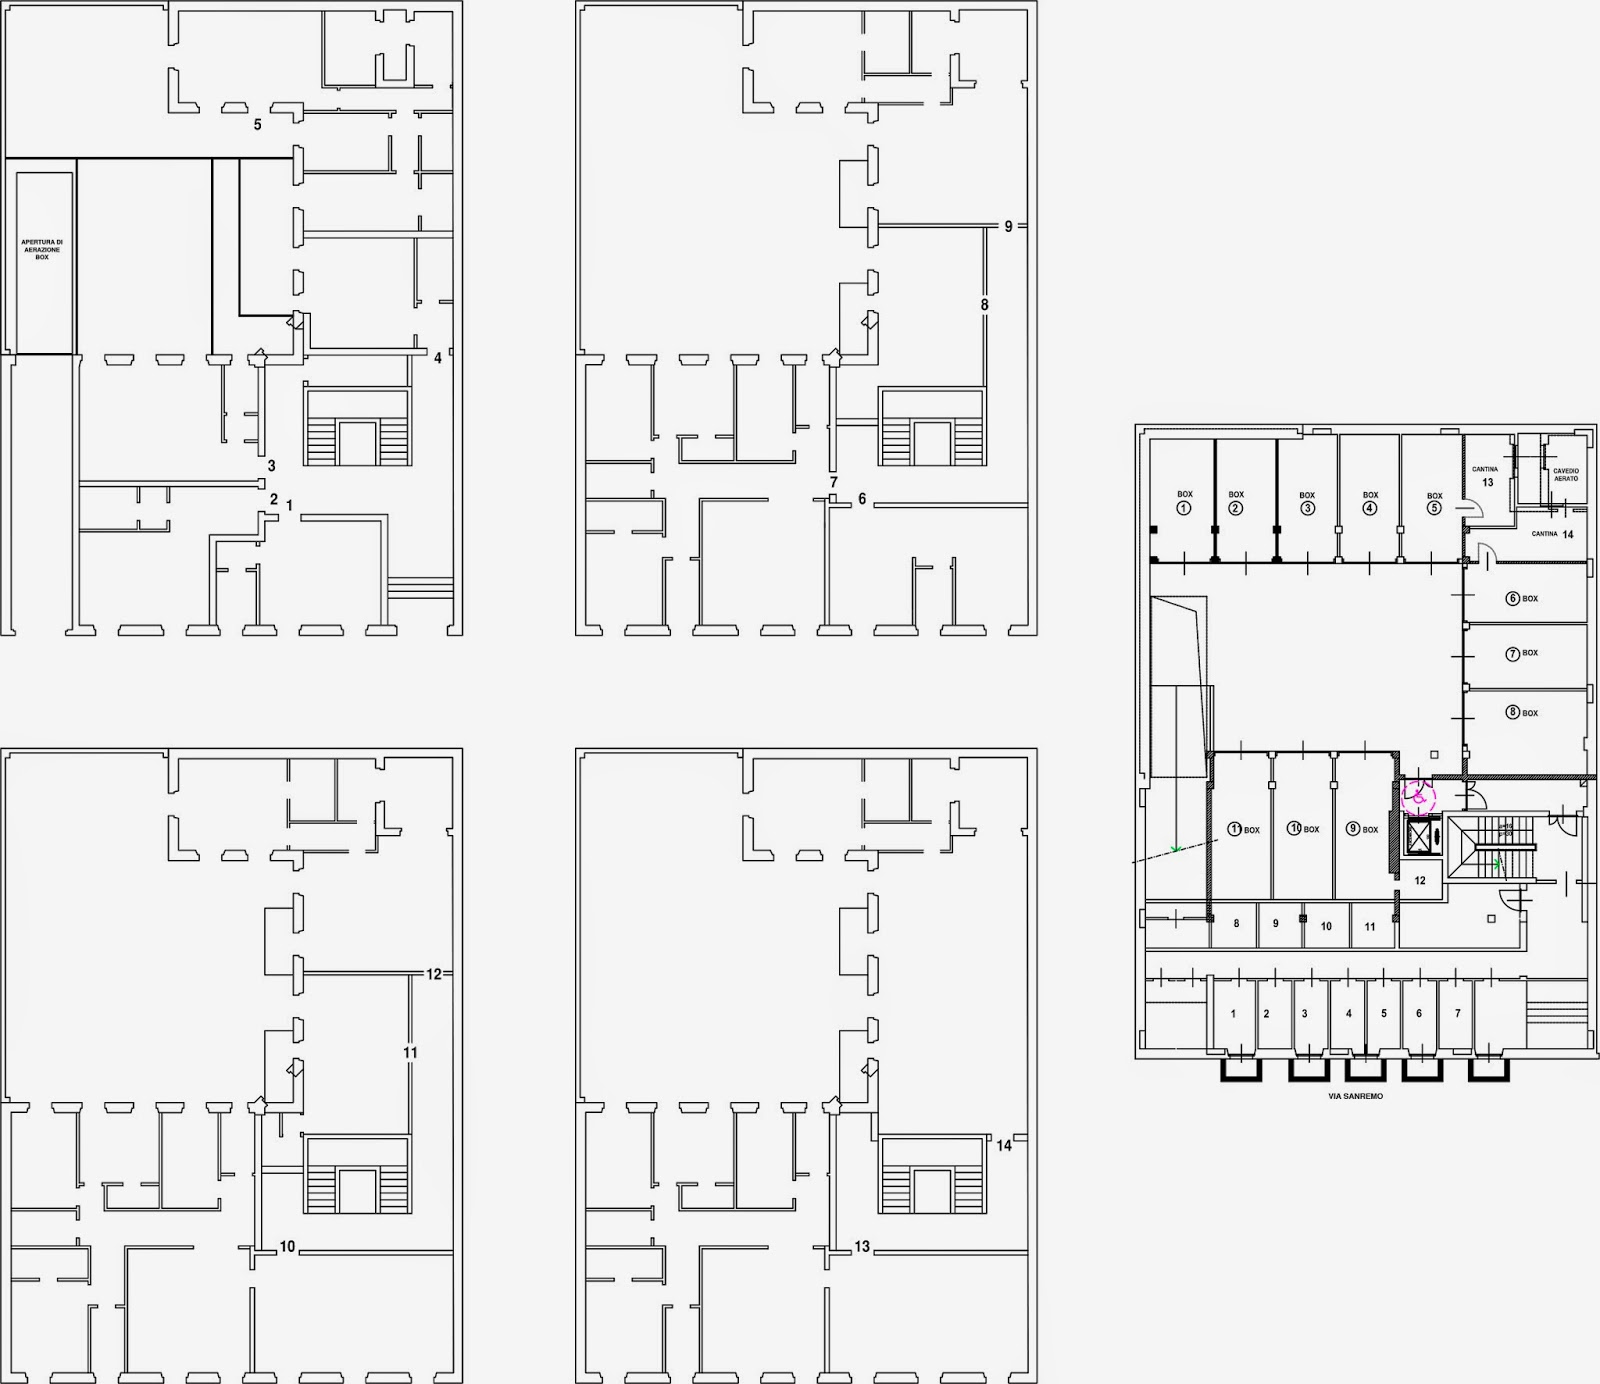 News galli immobili srl prestigiosi appartamenti 1 2 3 4 for Appartamenti prestigiosi milano